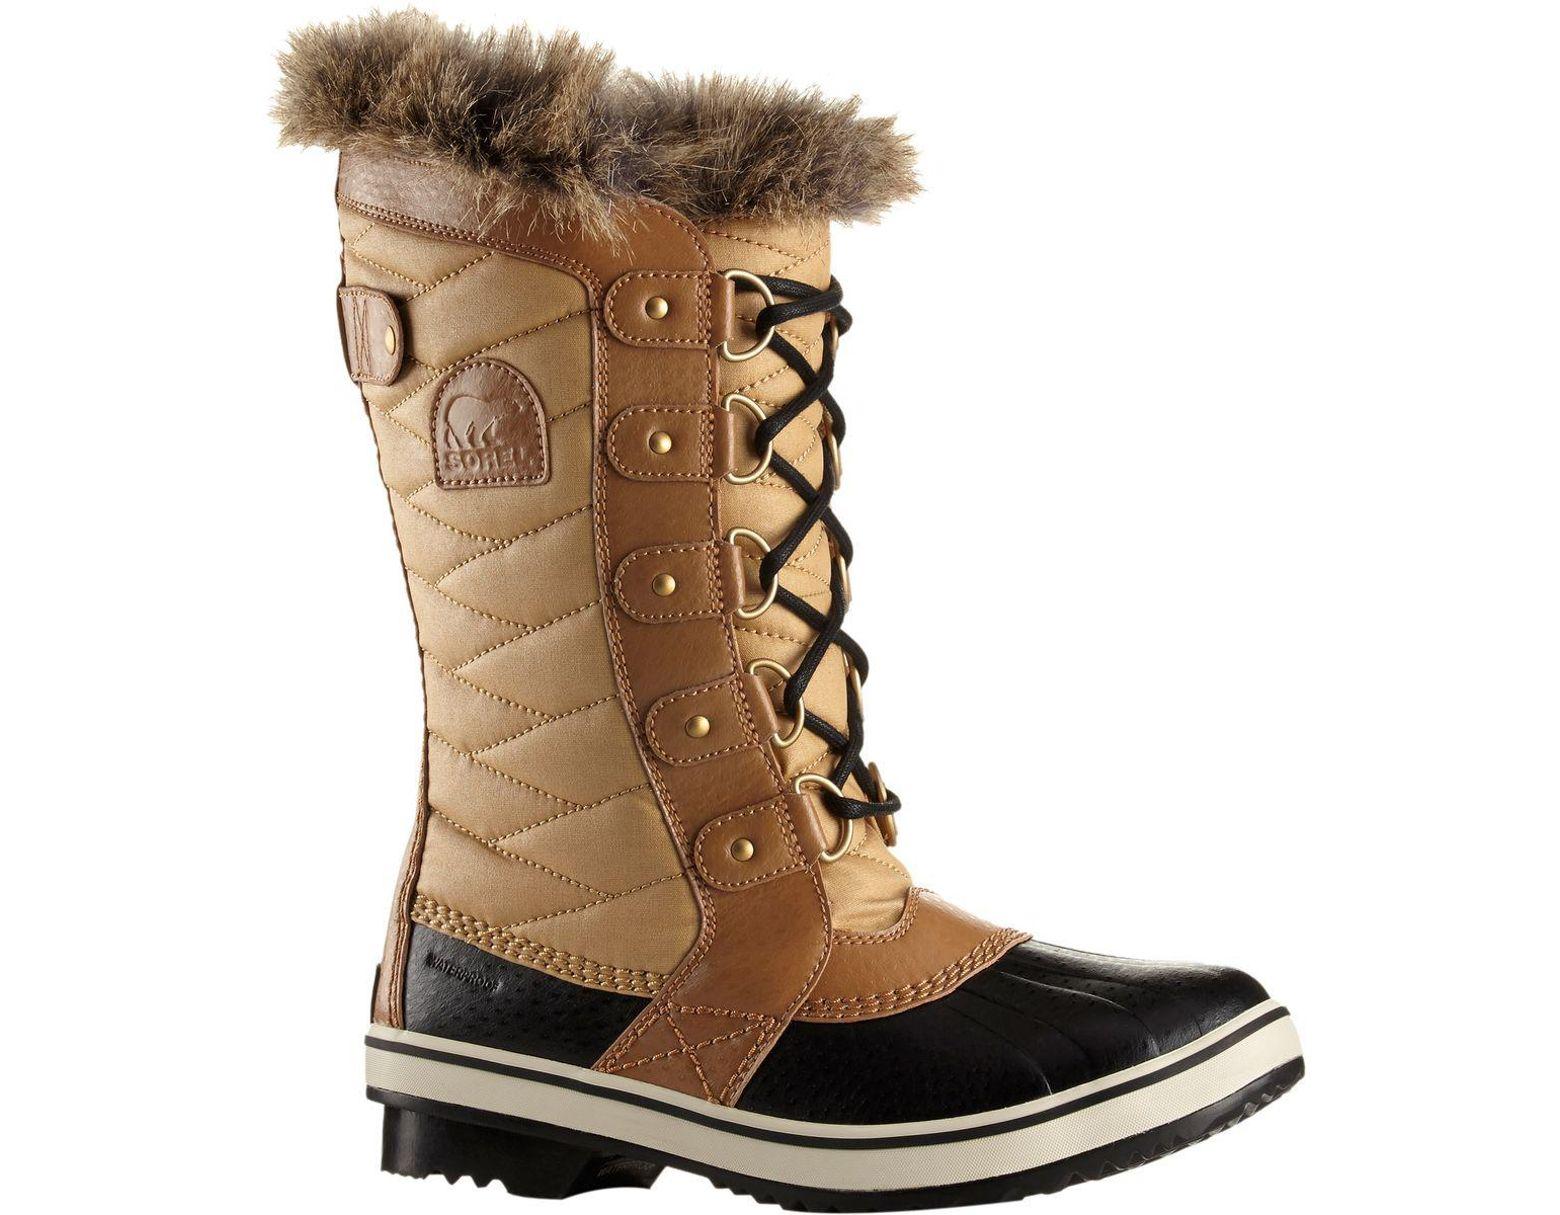 810384e1 Lyst - Sorel Tofino Ii Cvs Waterproof Winter Boots in Brown - Save 53%